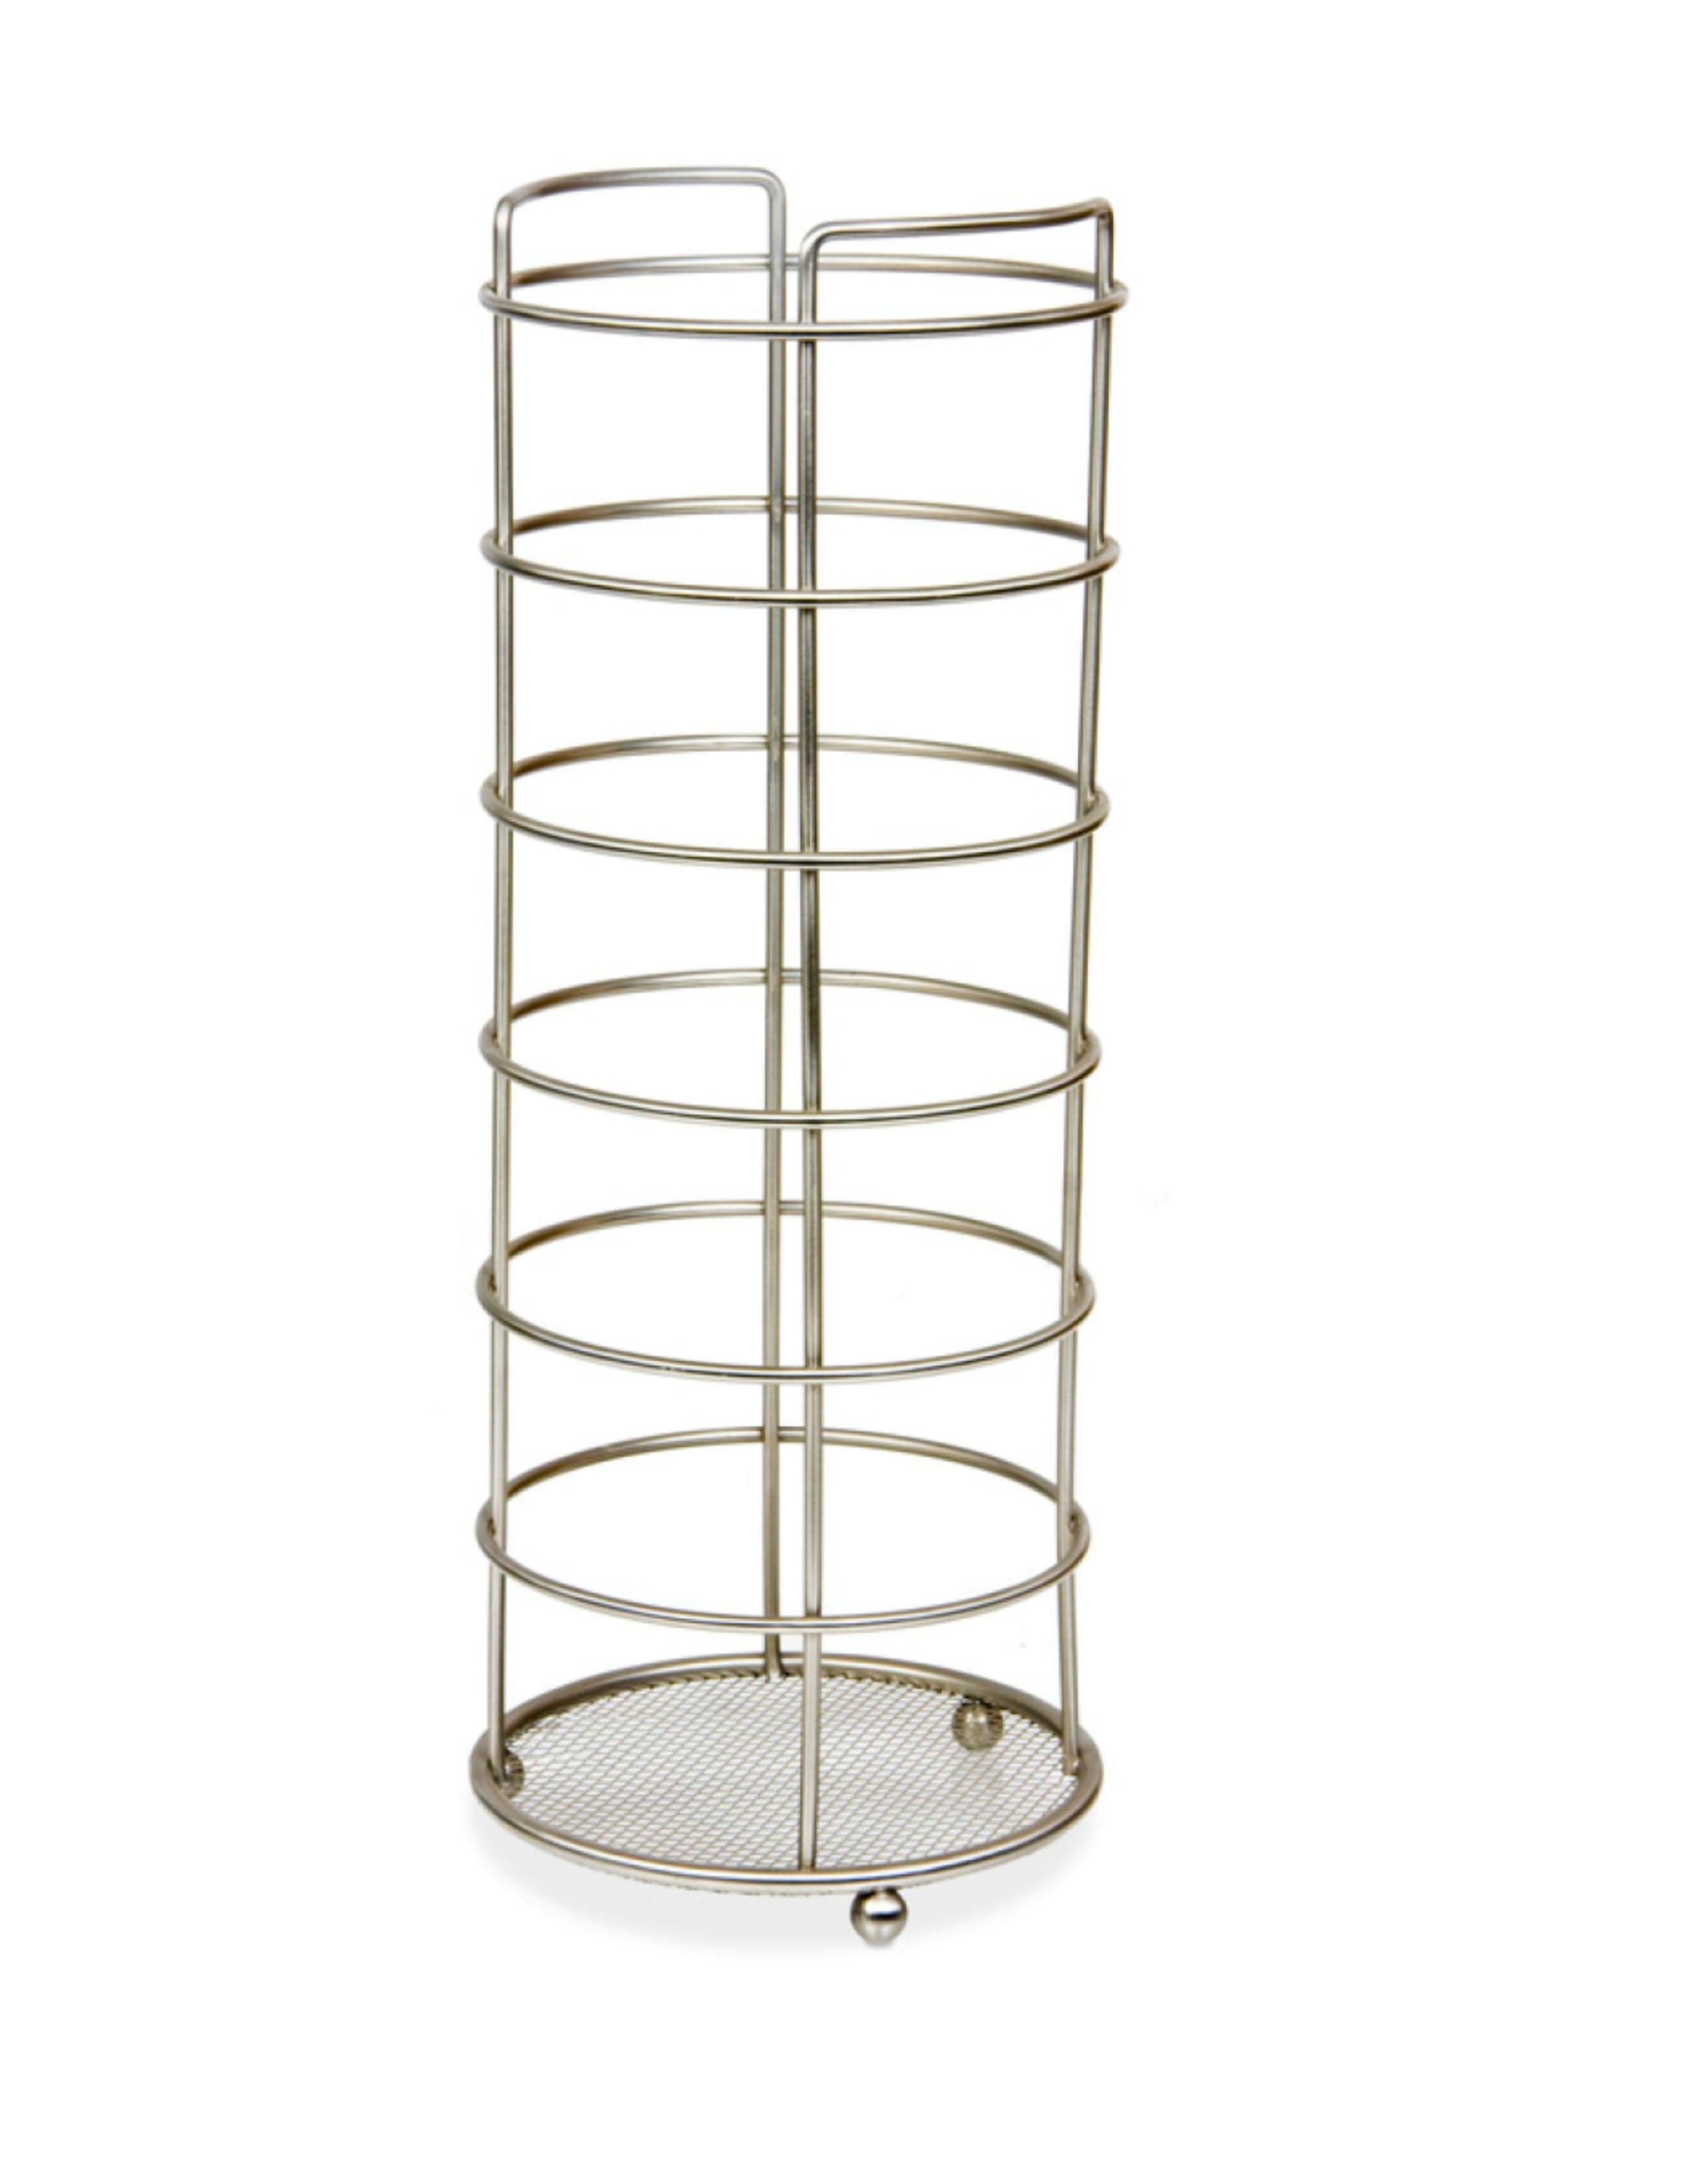 Wildon Home ® Freestanding Wire Toilet Paper Basket & Reviews   Wayfair